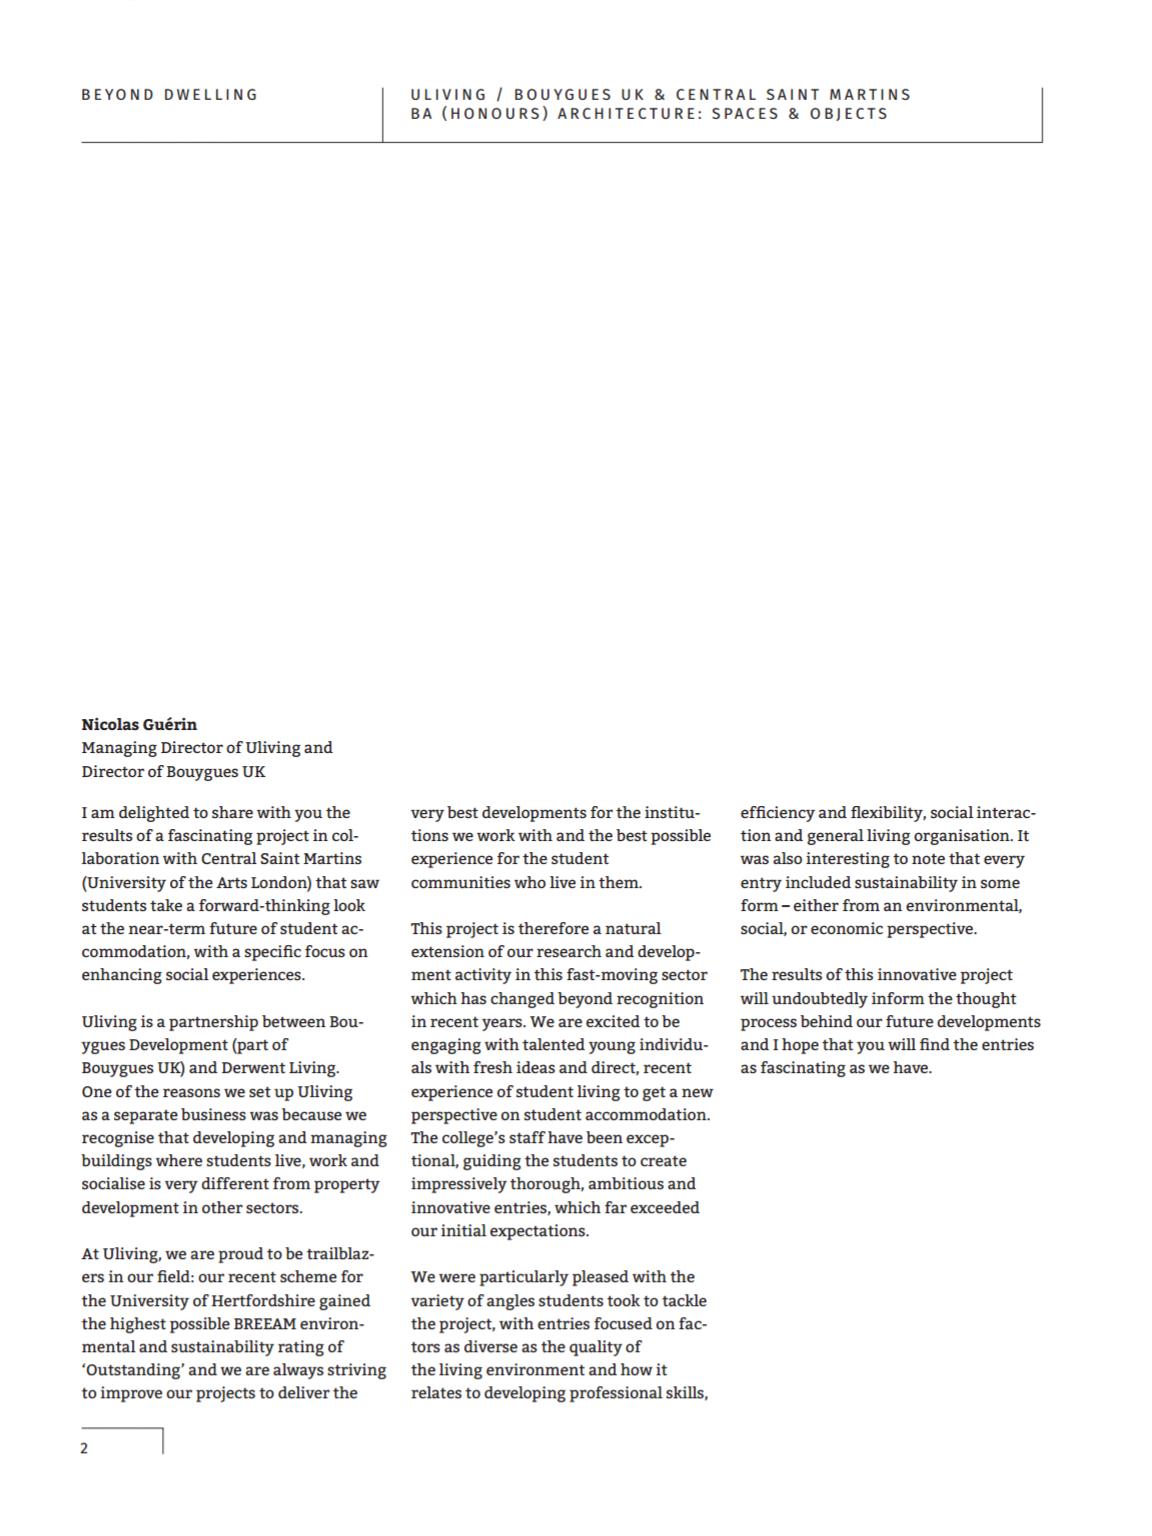 Comparison/contrast essay buddist christianity